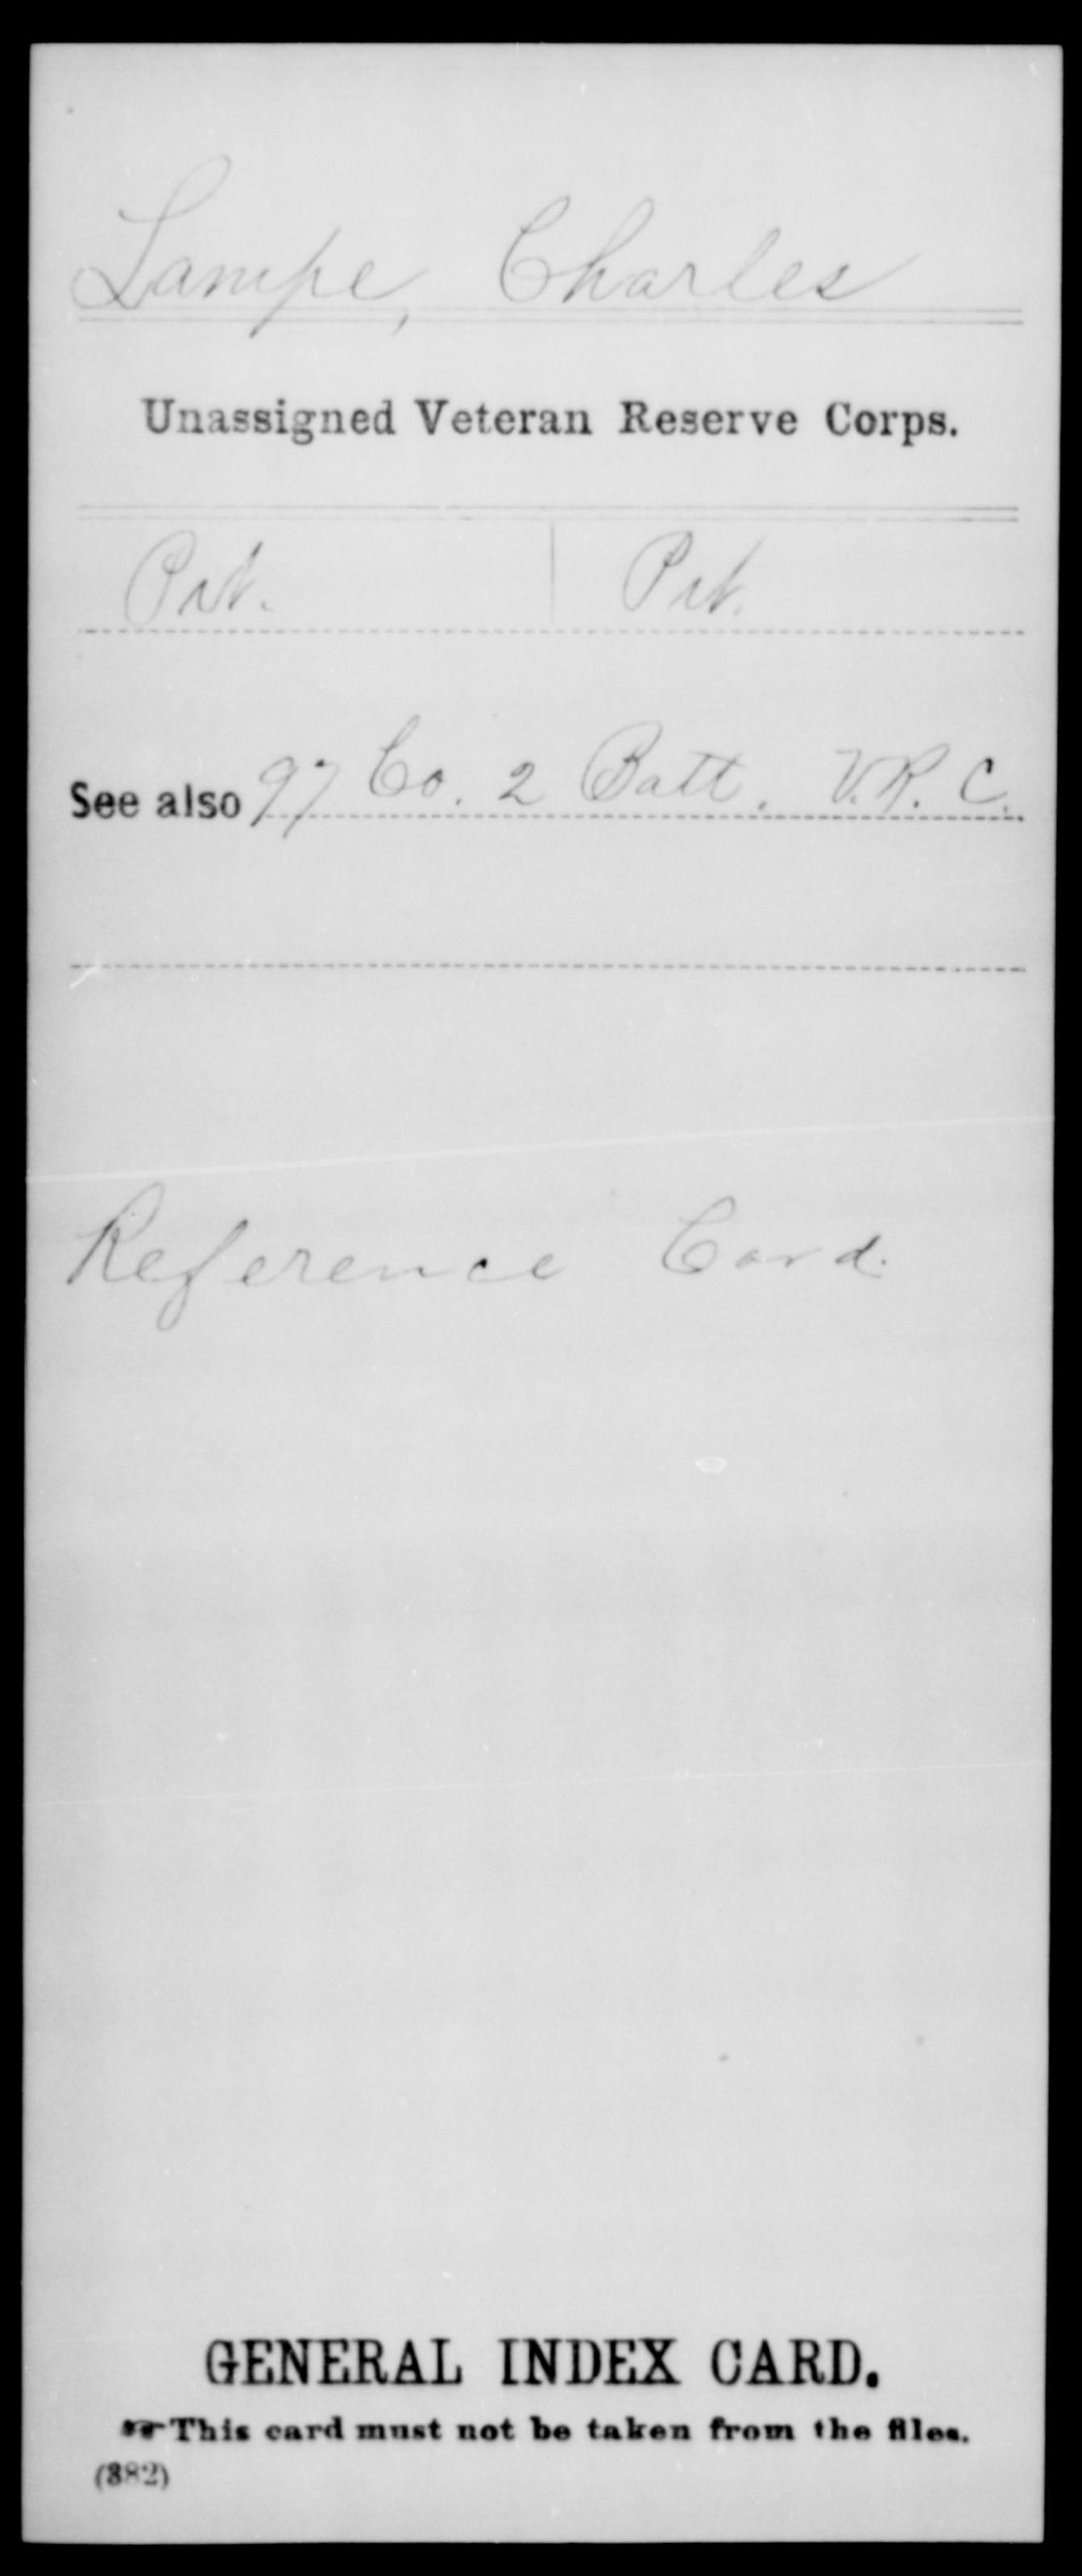 Lampe, Charles - Unassigned Veteran Reserve Corps